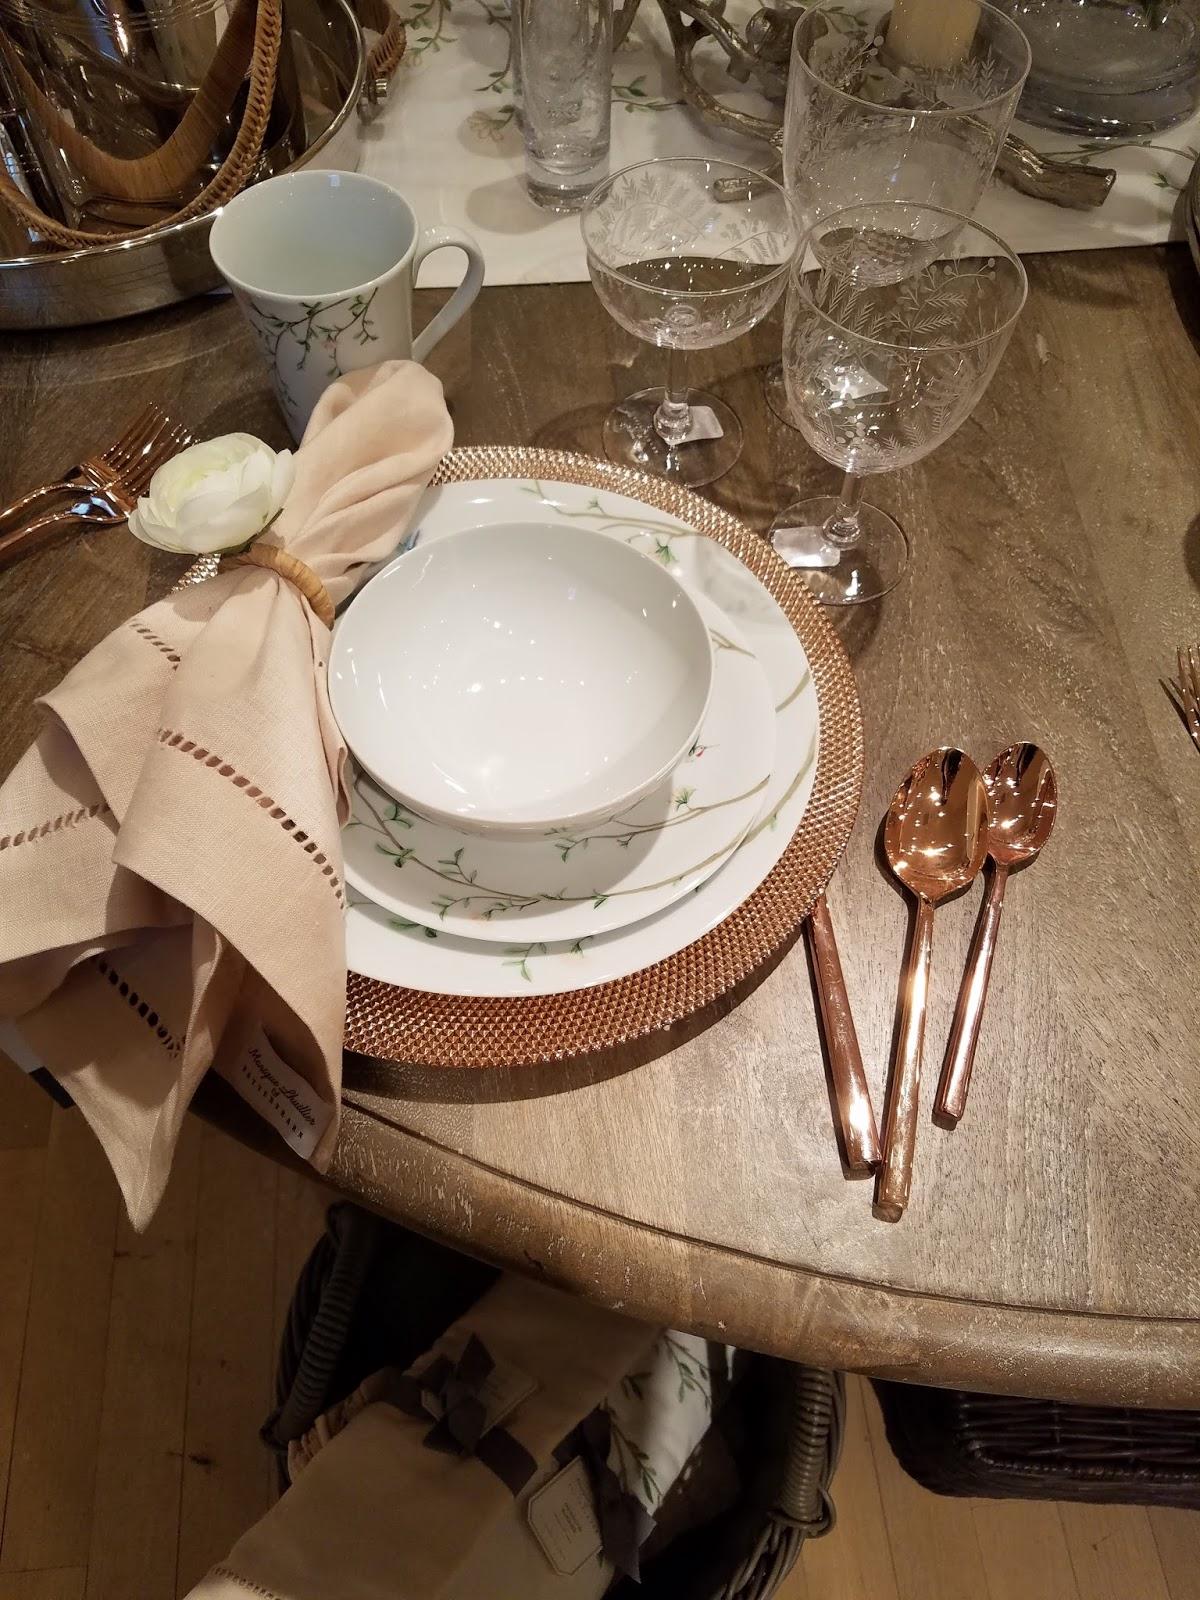 Very pretty dinnerware & A Home for Elegance: Dinnerware at Pottery Barn